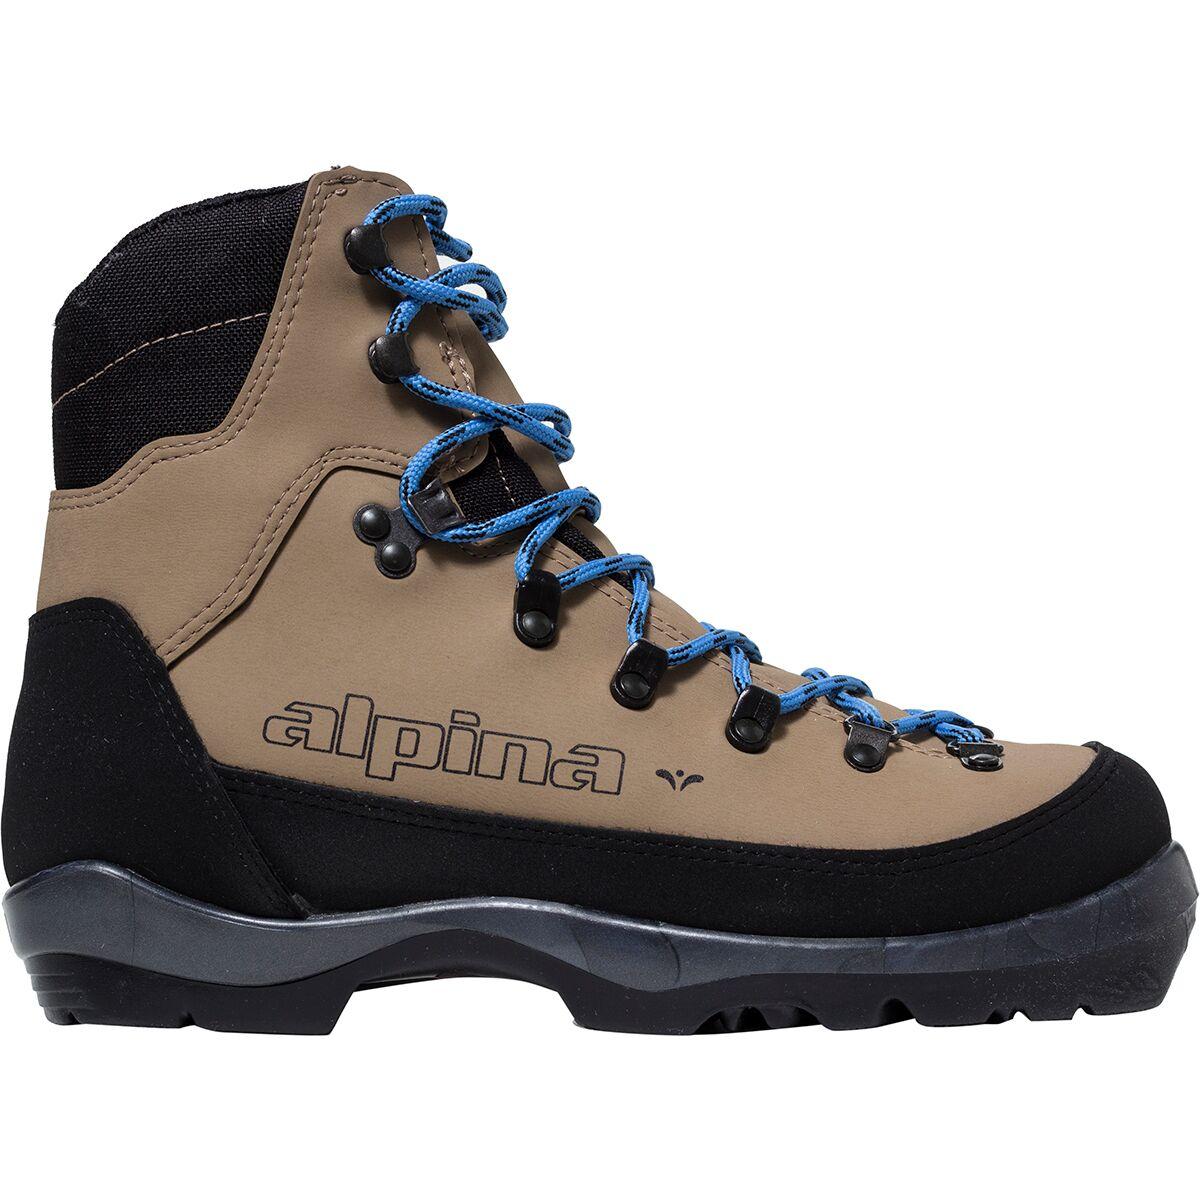 Alpina Montana Eve Touring Boot Womens